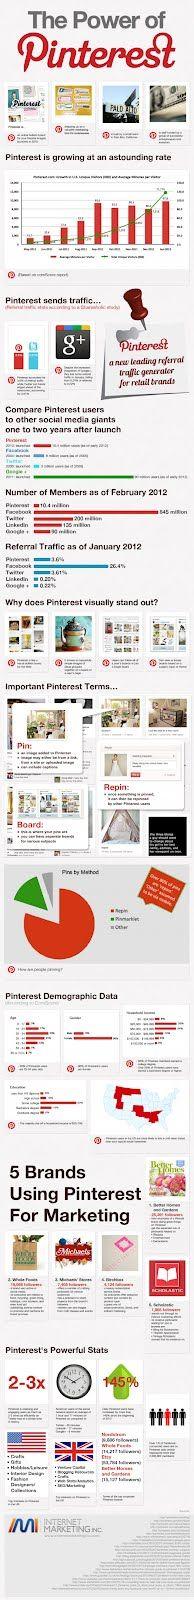 Infografía detallada sobre Pinterest (2012)